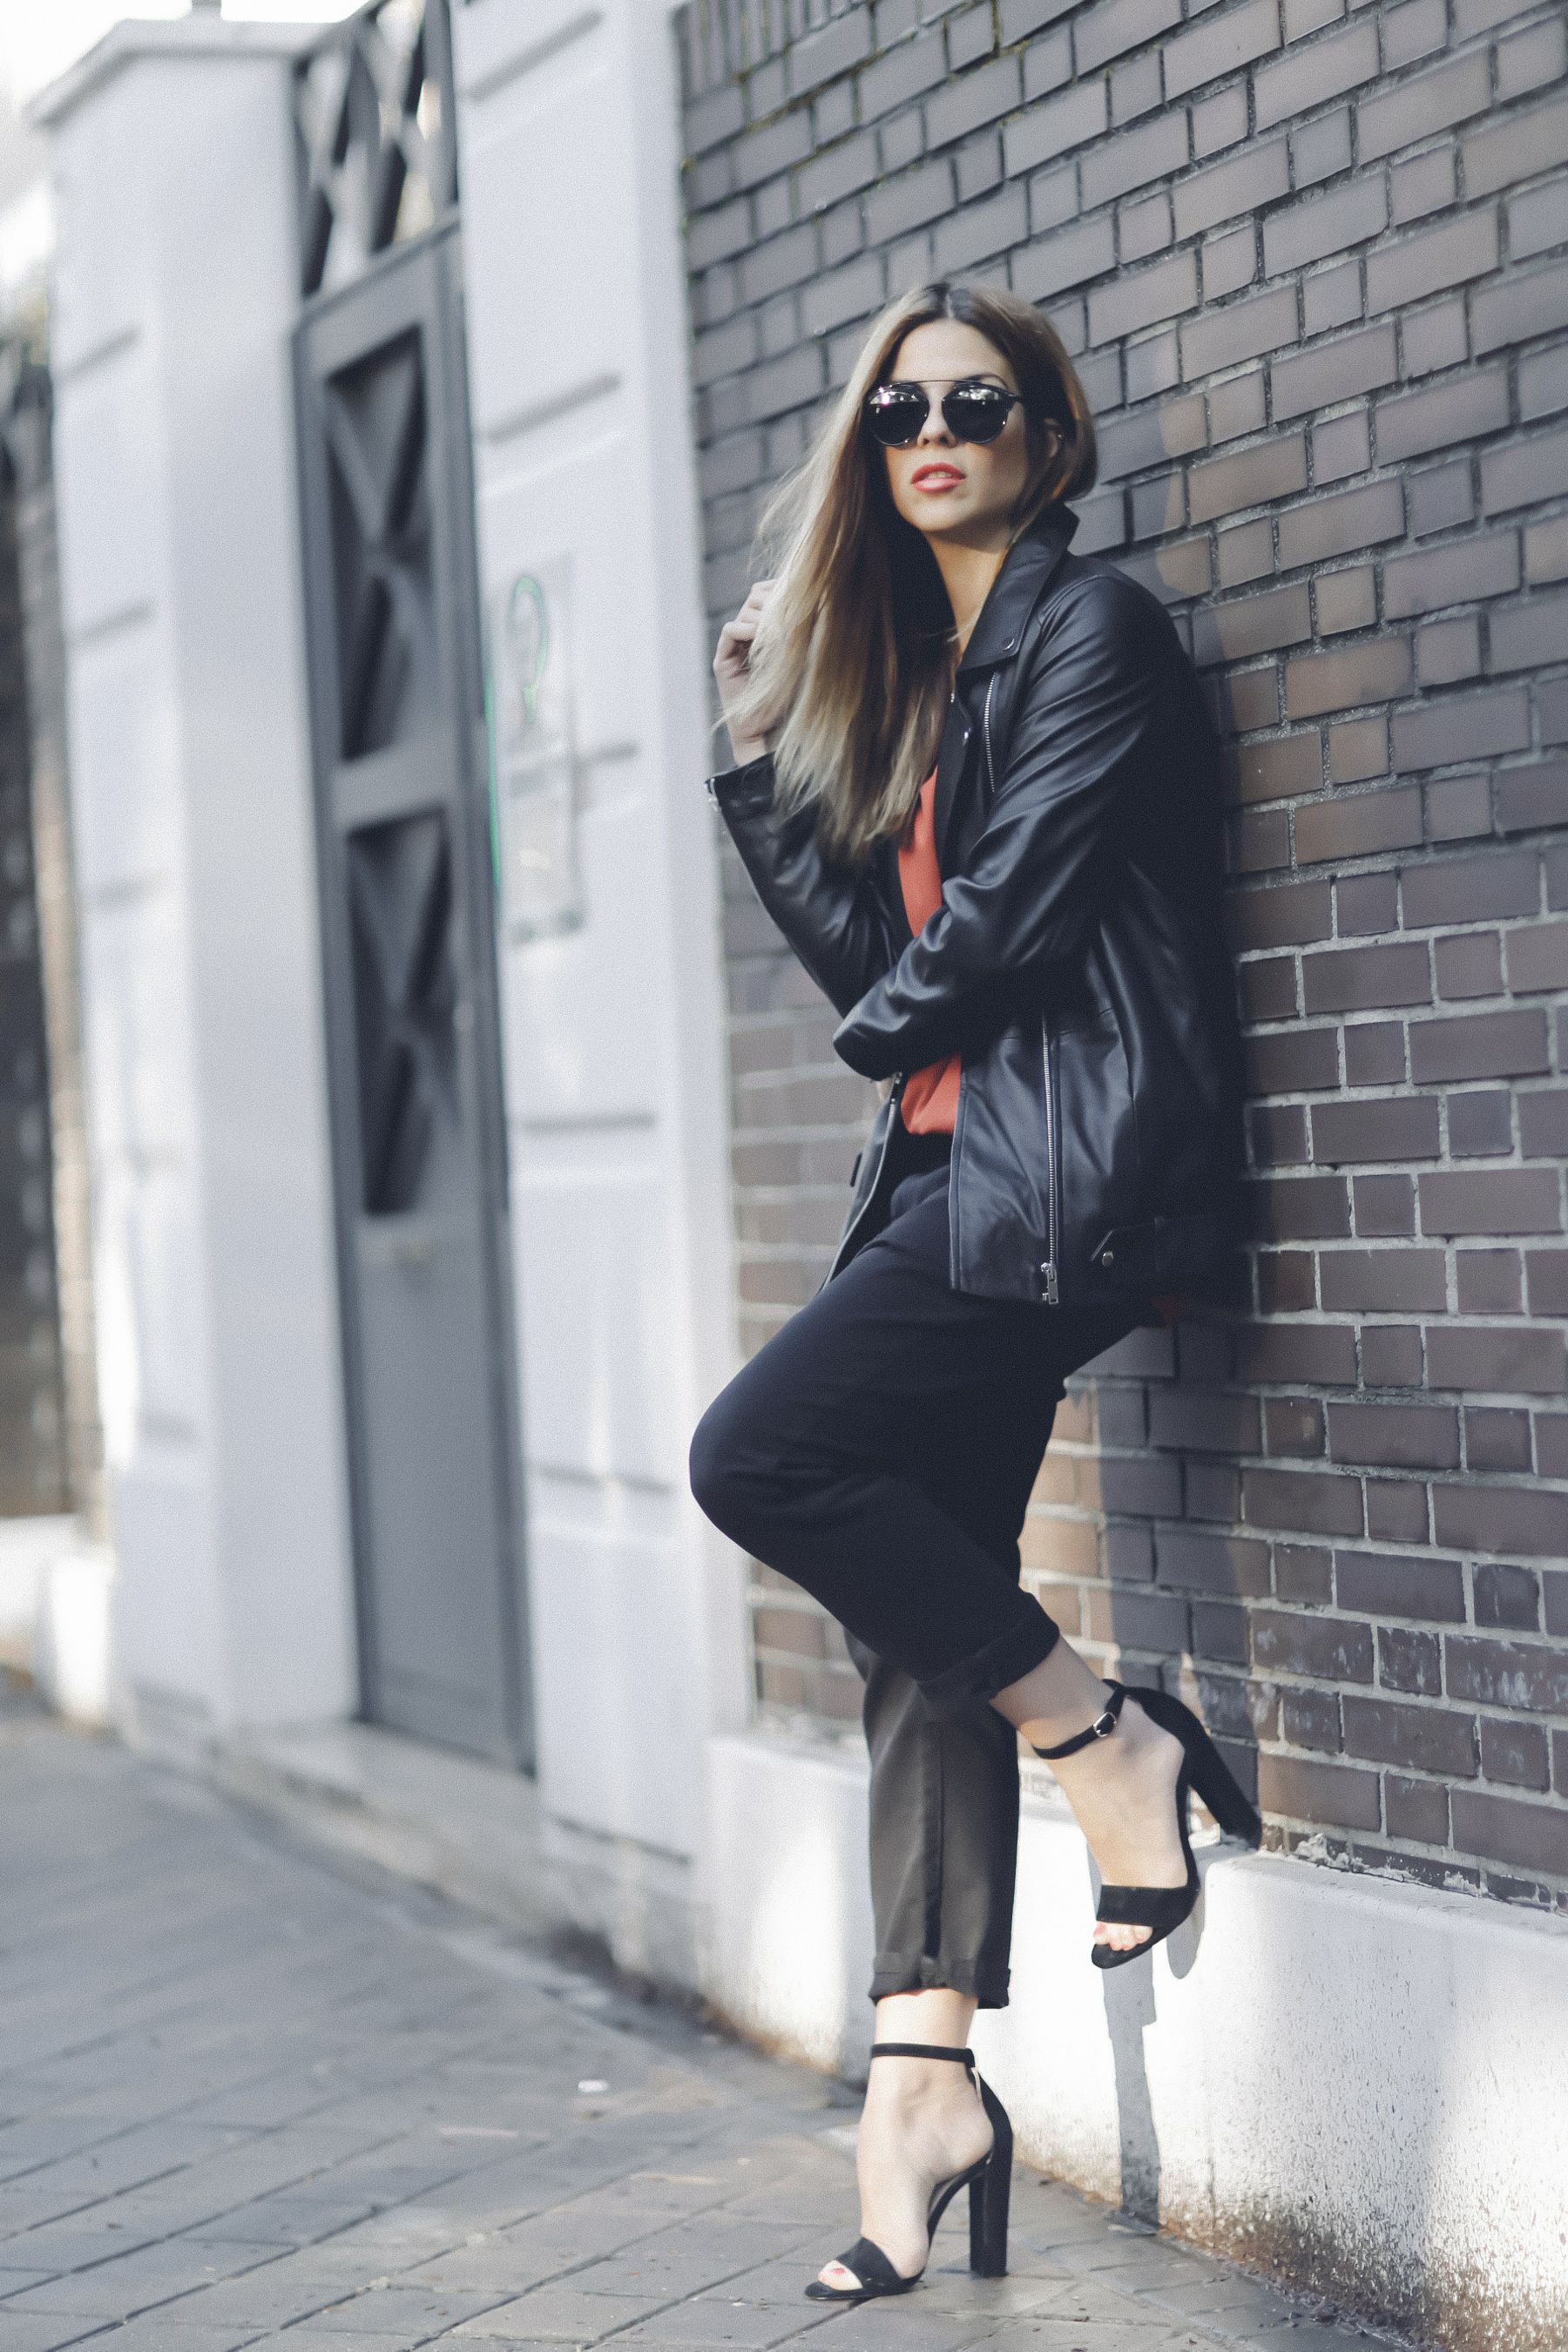 sandalias sandals mbym outfit look primavera spring camiseta zara steve madden Dior gafas de sol sunglasses street style trendy taste_6